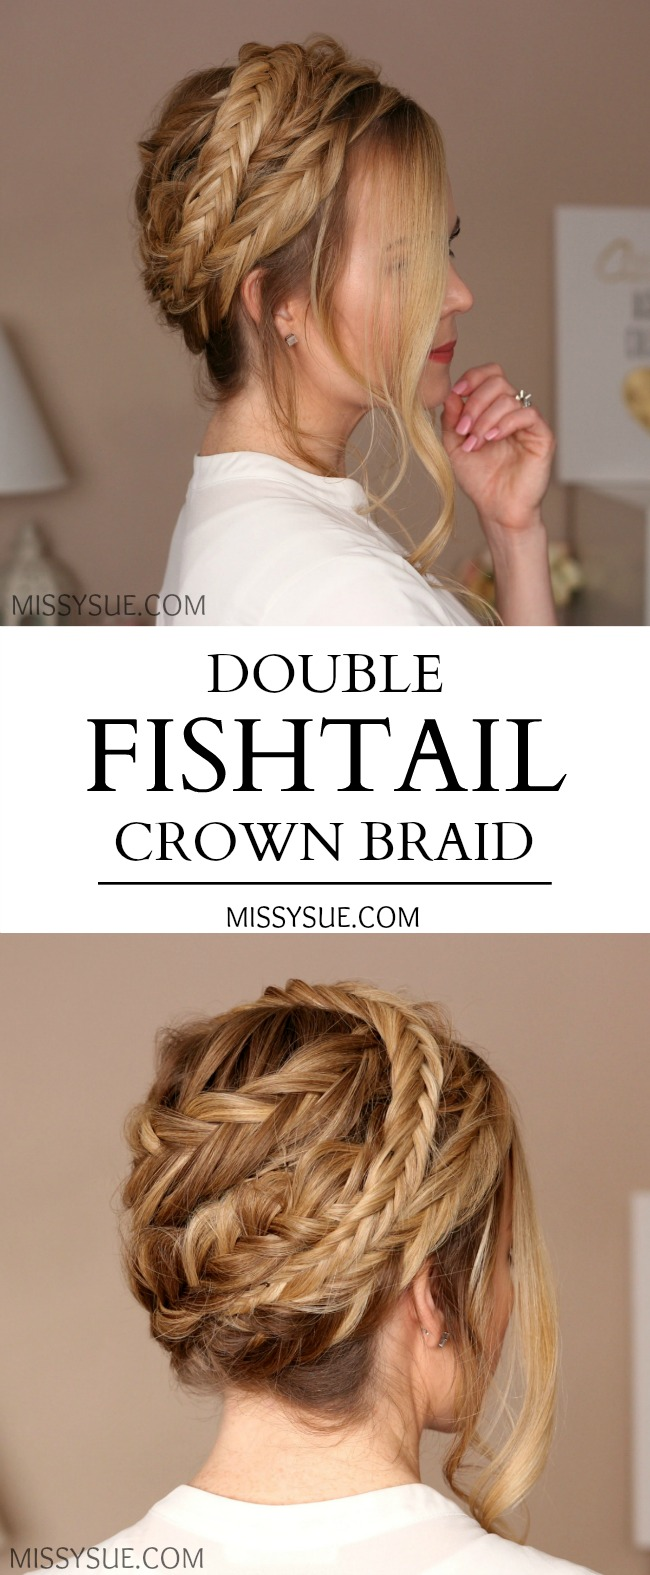 Double Fishtail Crown Braid